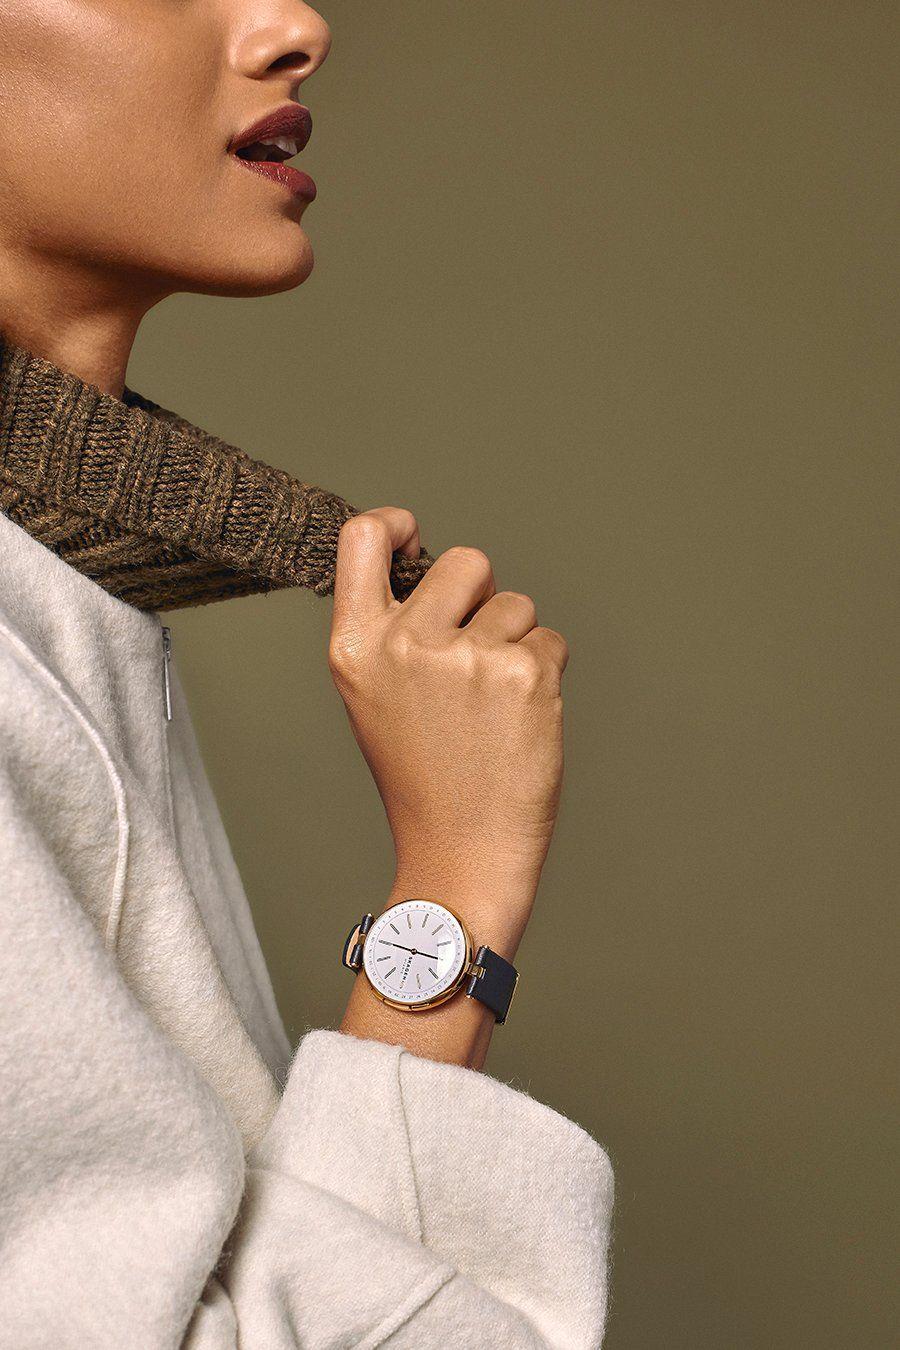 702ff60741bde Hybrid Smartwatch - Signatur T-Bar Black Leather Photo by  Sharon Radisch